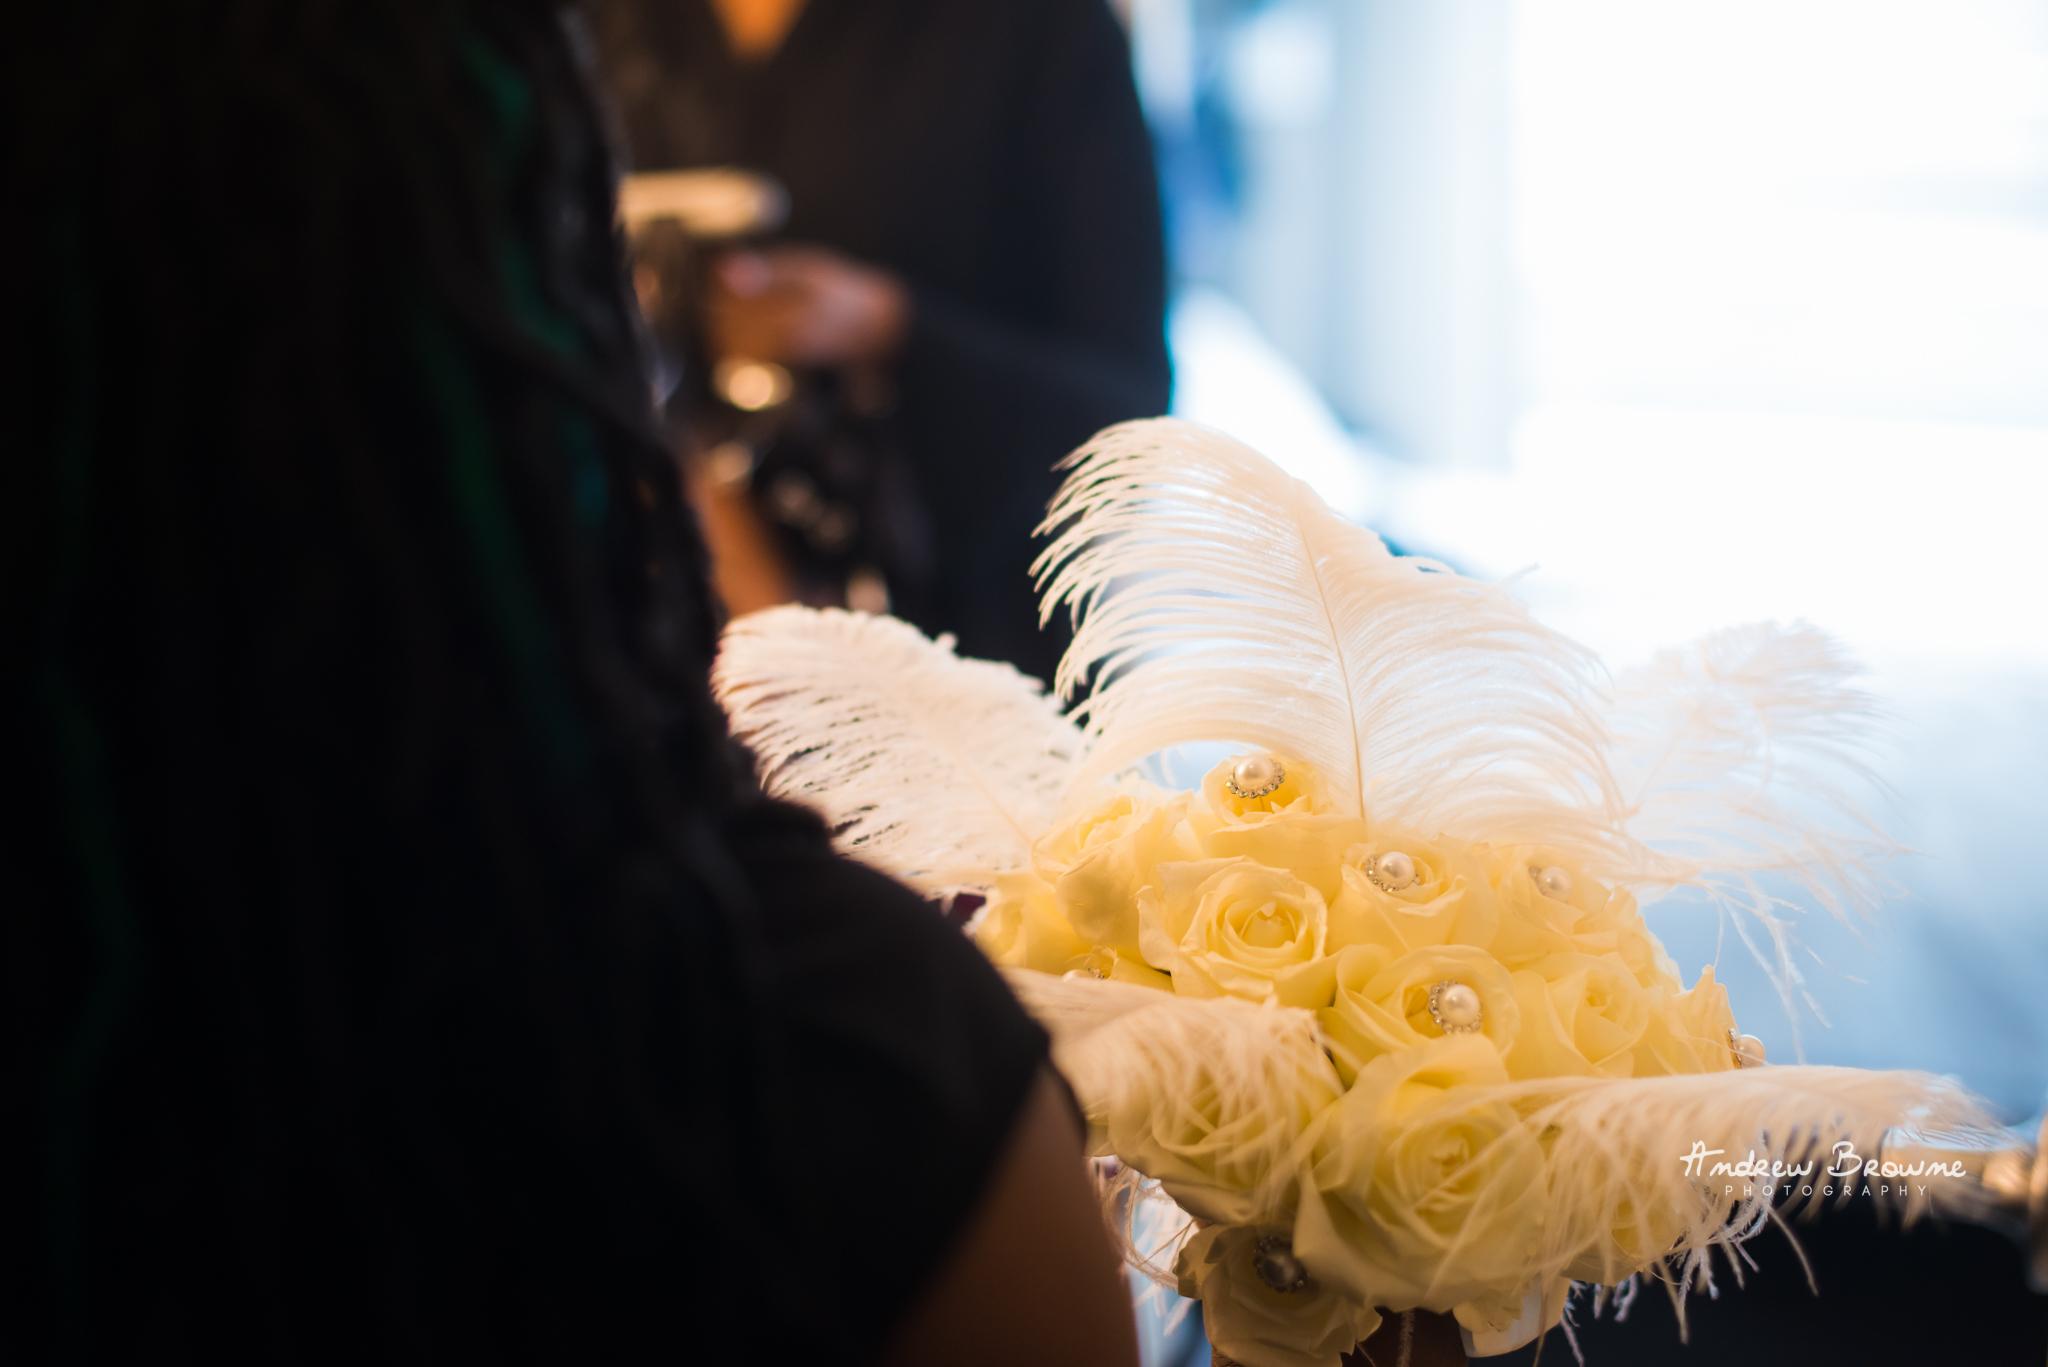 Harlem Renaissance Brooklyn Loft Wedding Flowers (5).jpg